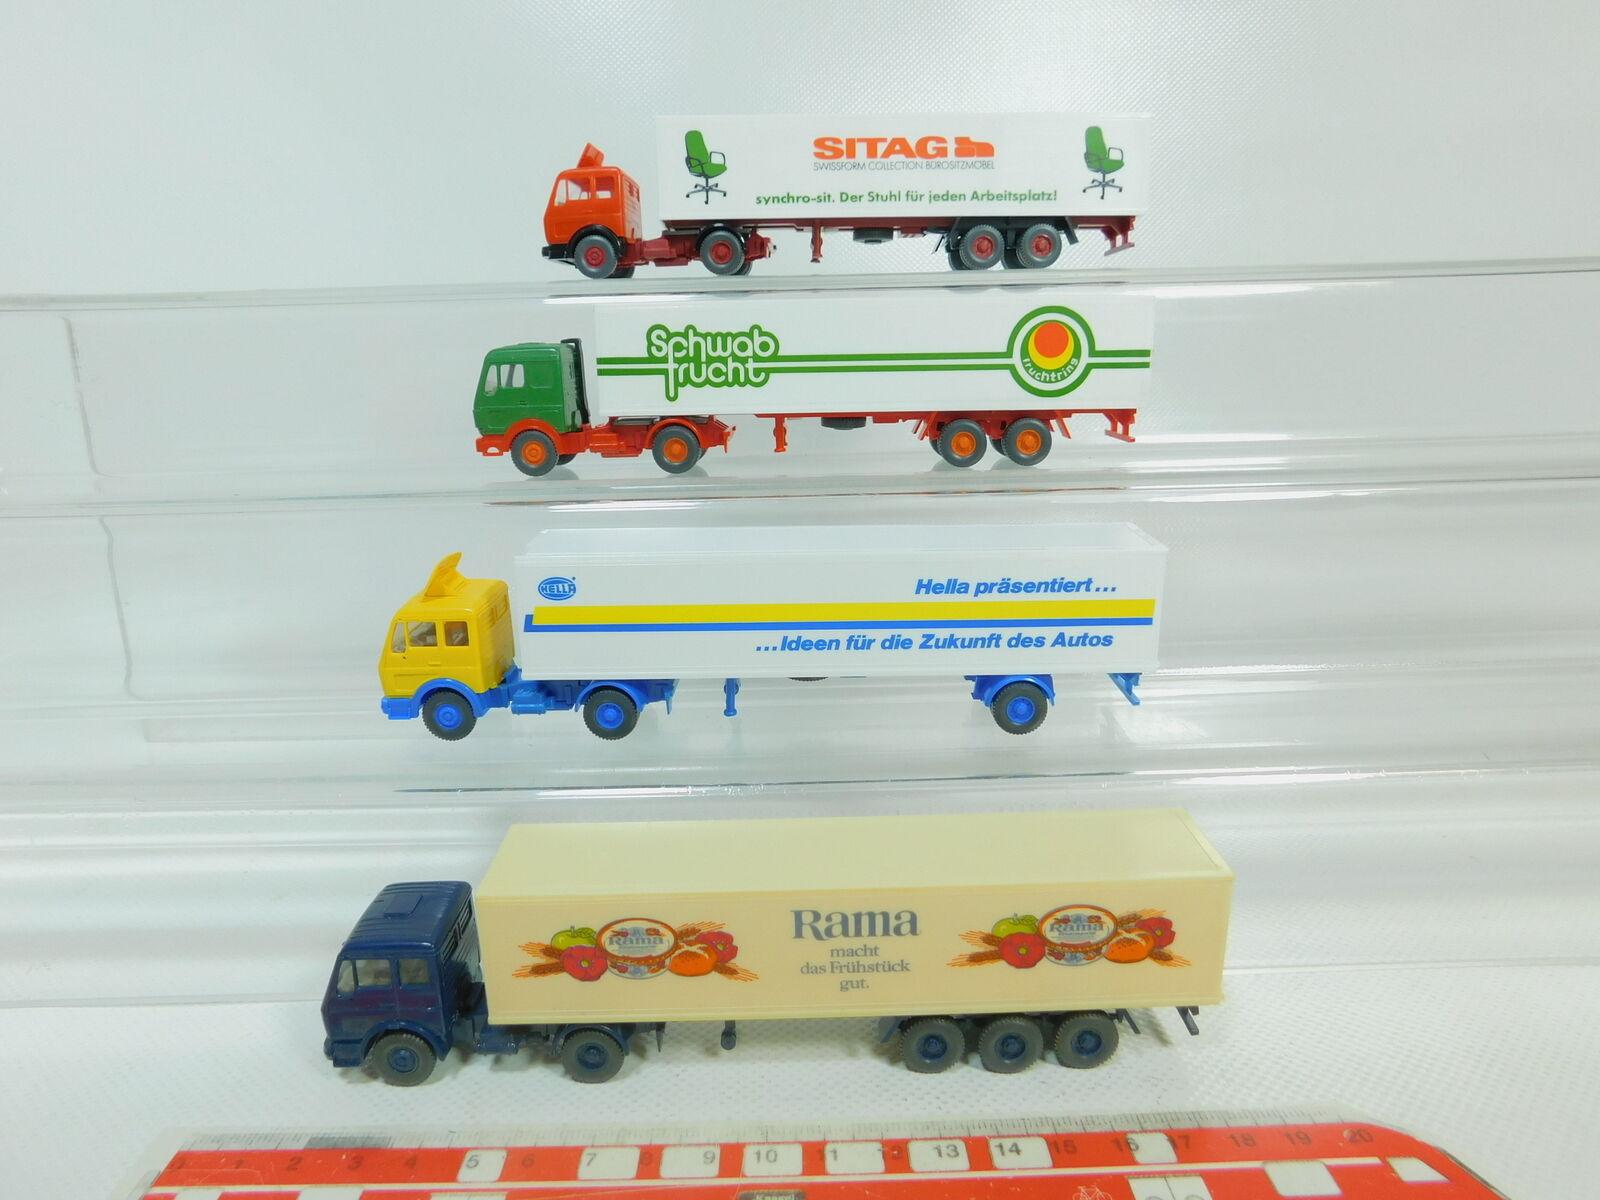 BO682-0,5 x Wiking H0   1 87 Lorry MB  Rama + Sitag + Hella + Schwab Fruit,VG